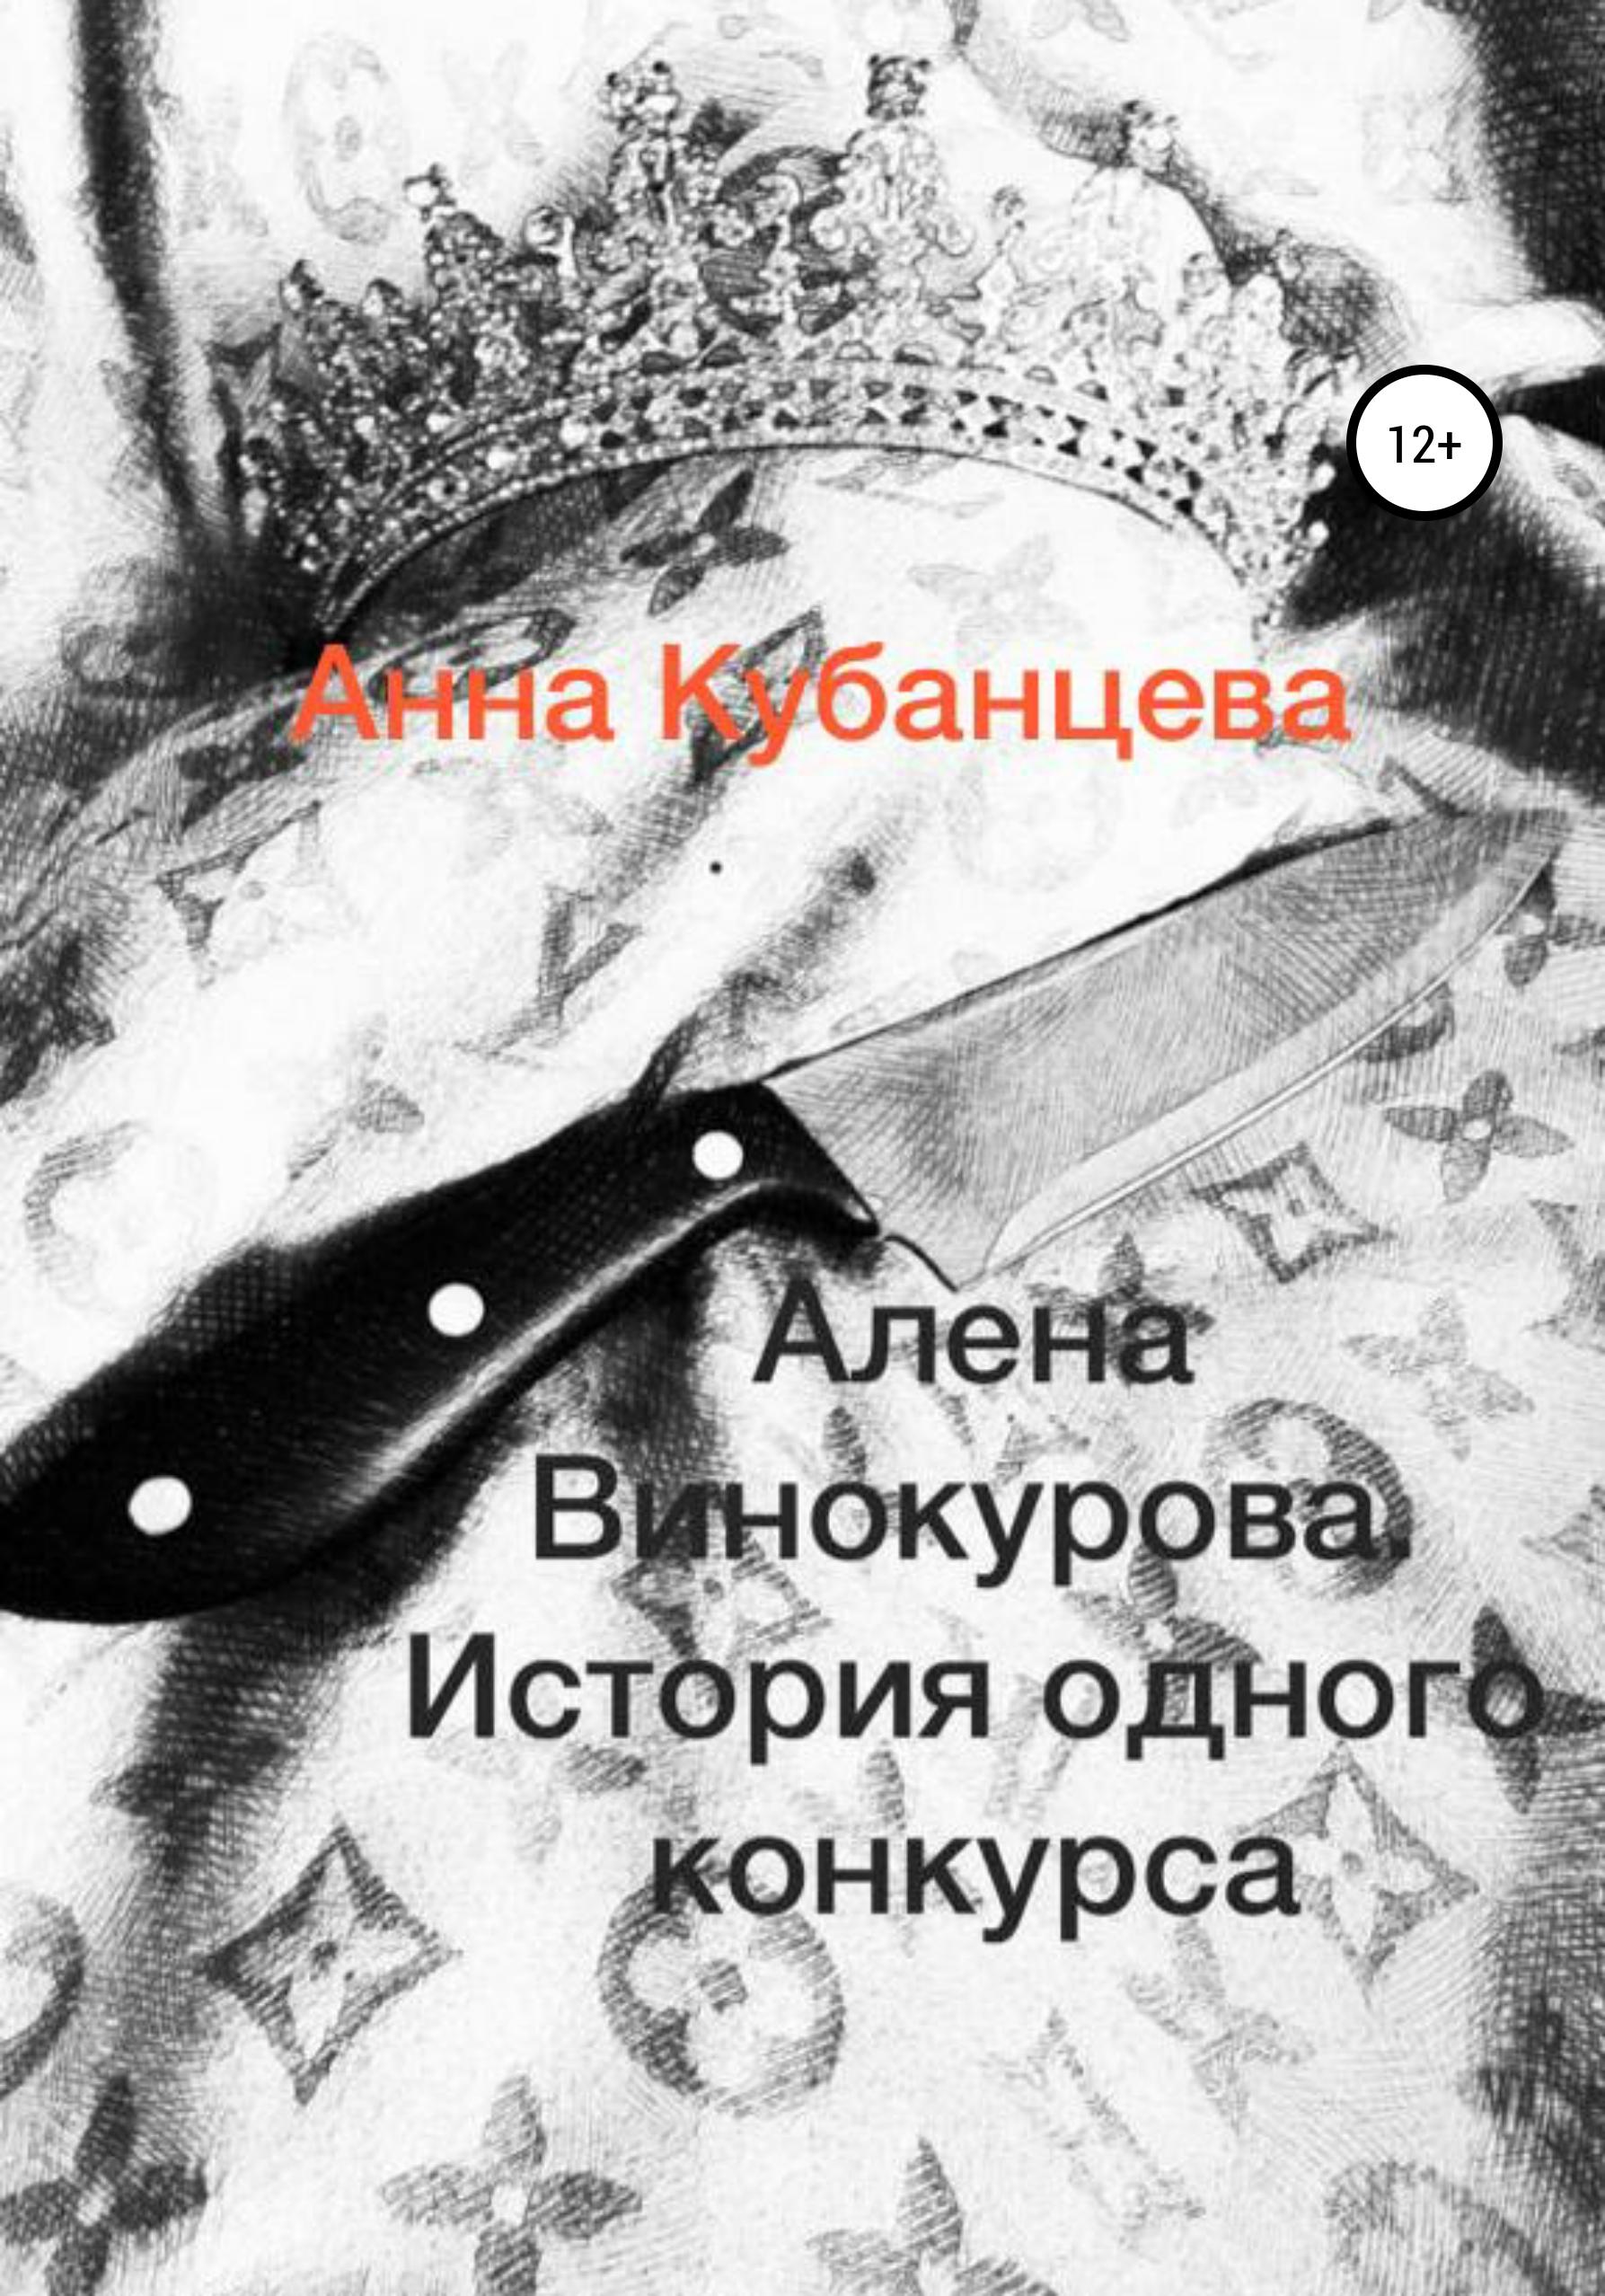 Анна Сергеевна Кубанцева Алена Винокурова. История одного конкурса